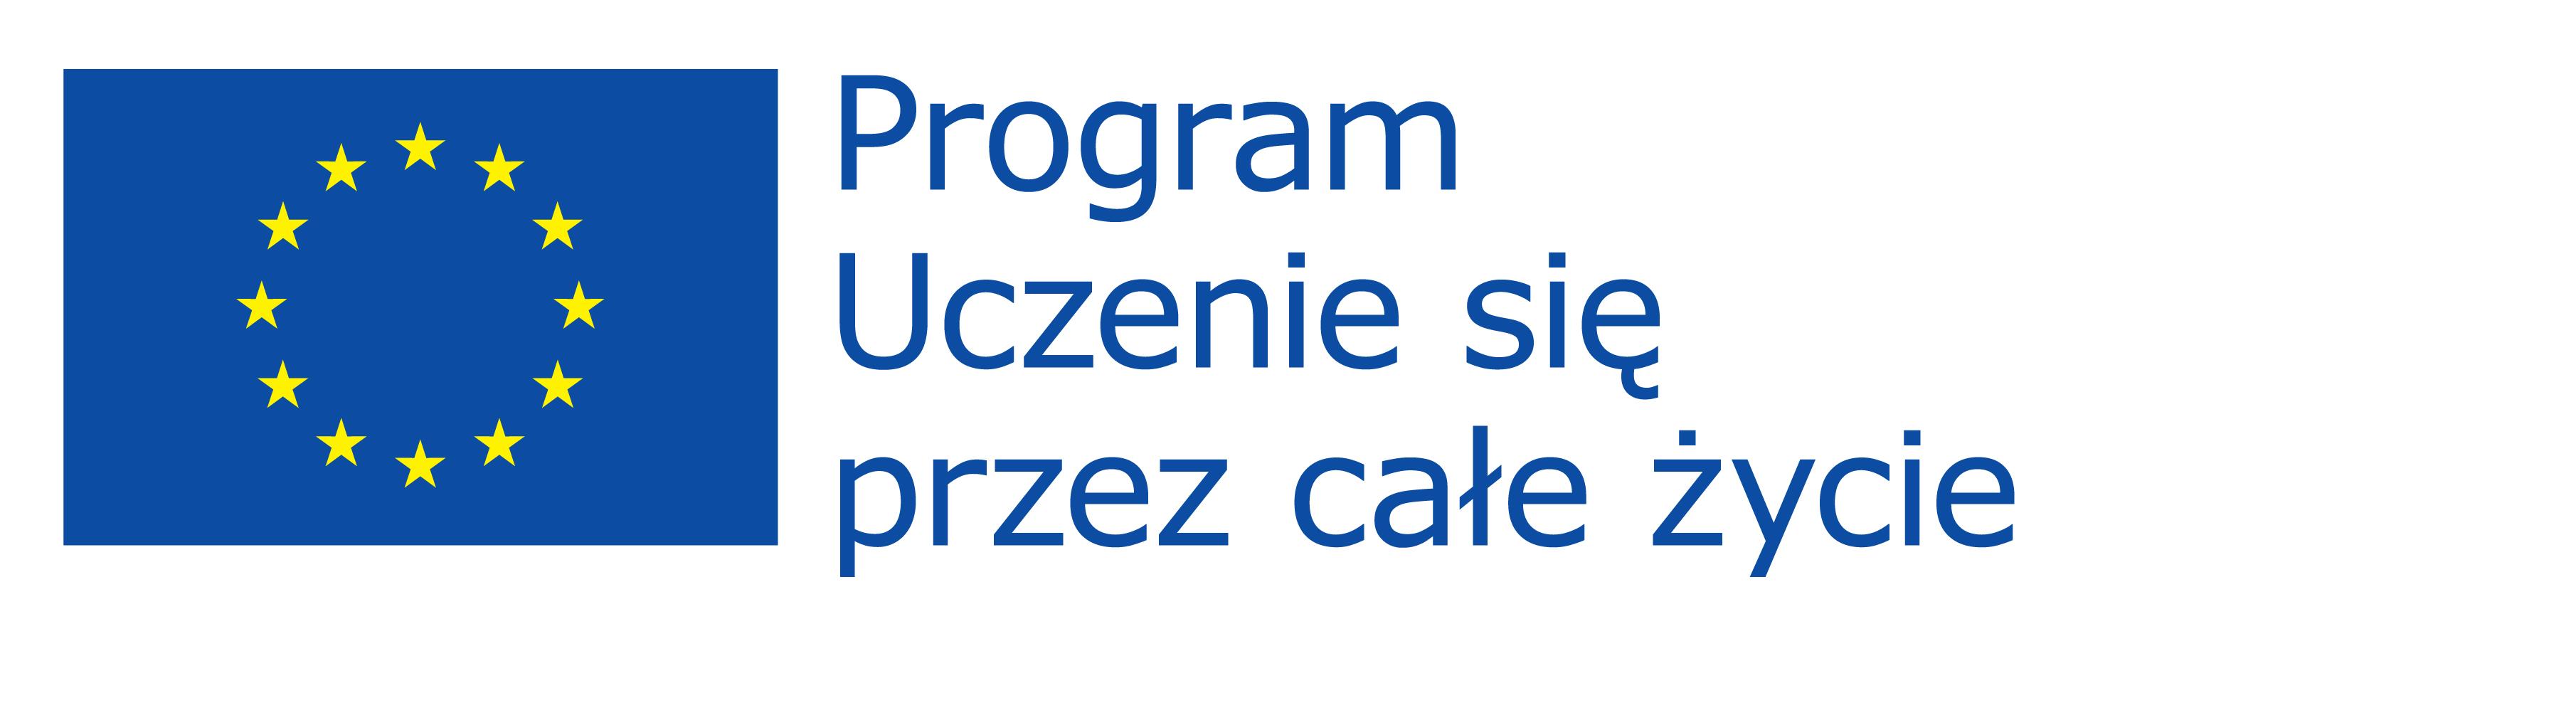 http://ggwieliszew.szkolnastrona.pl/container/eu-flag-llp-pl-01.jpg